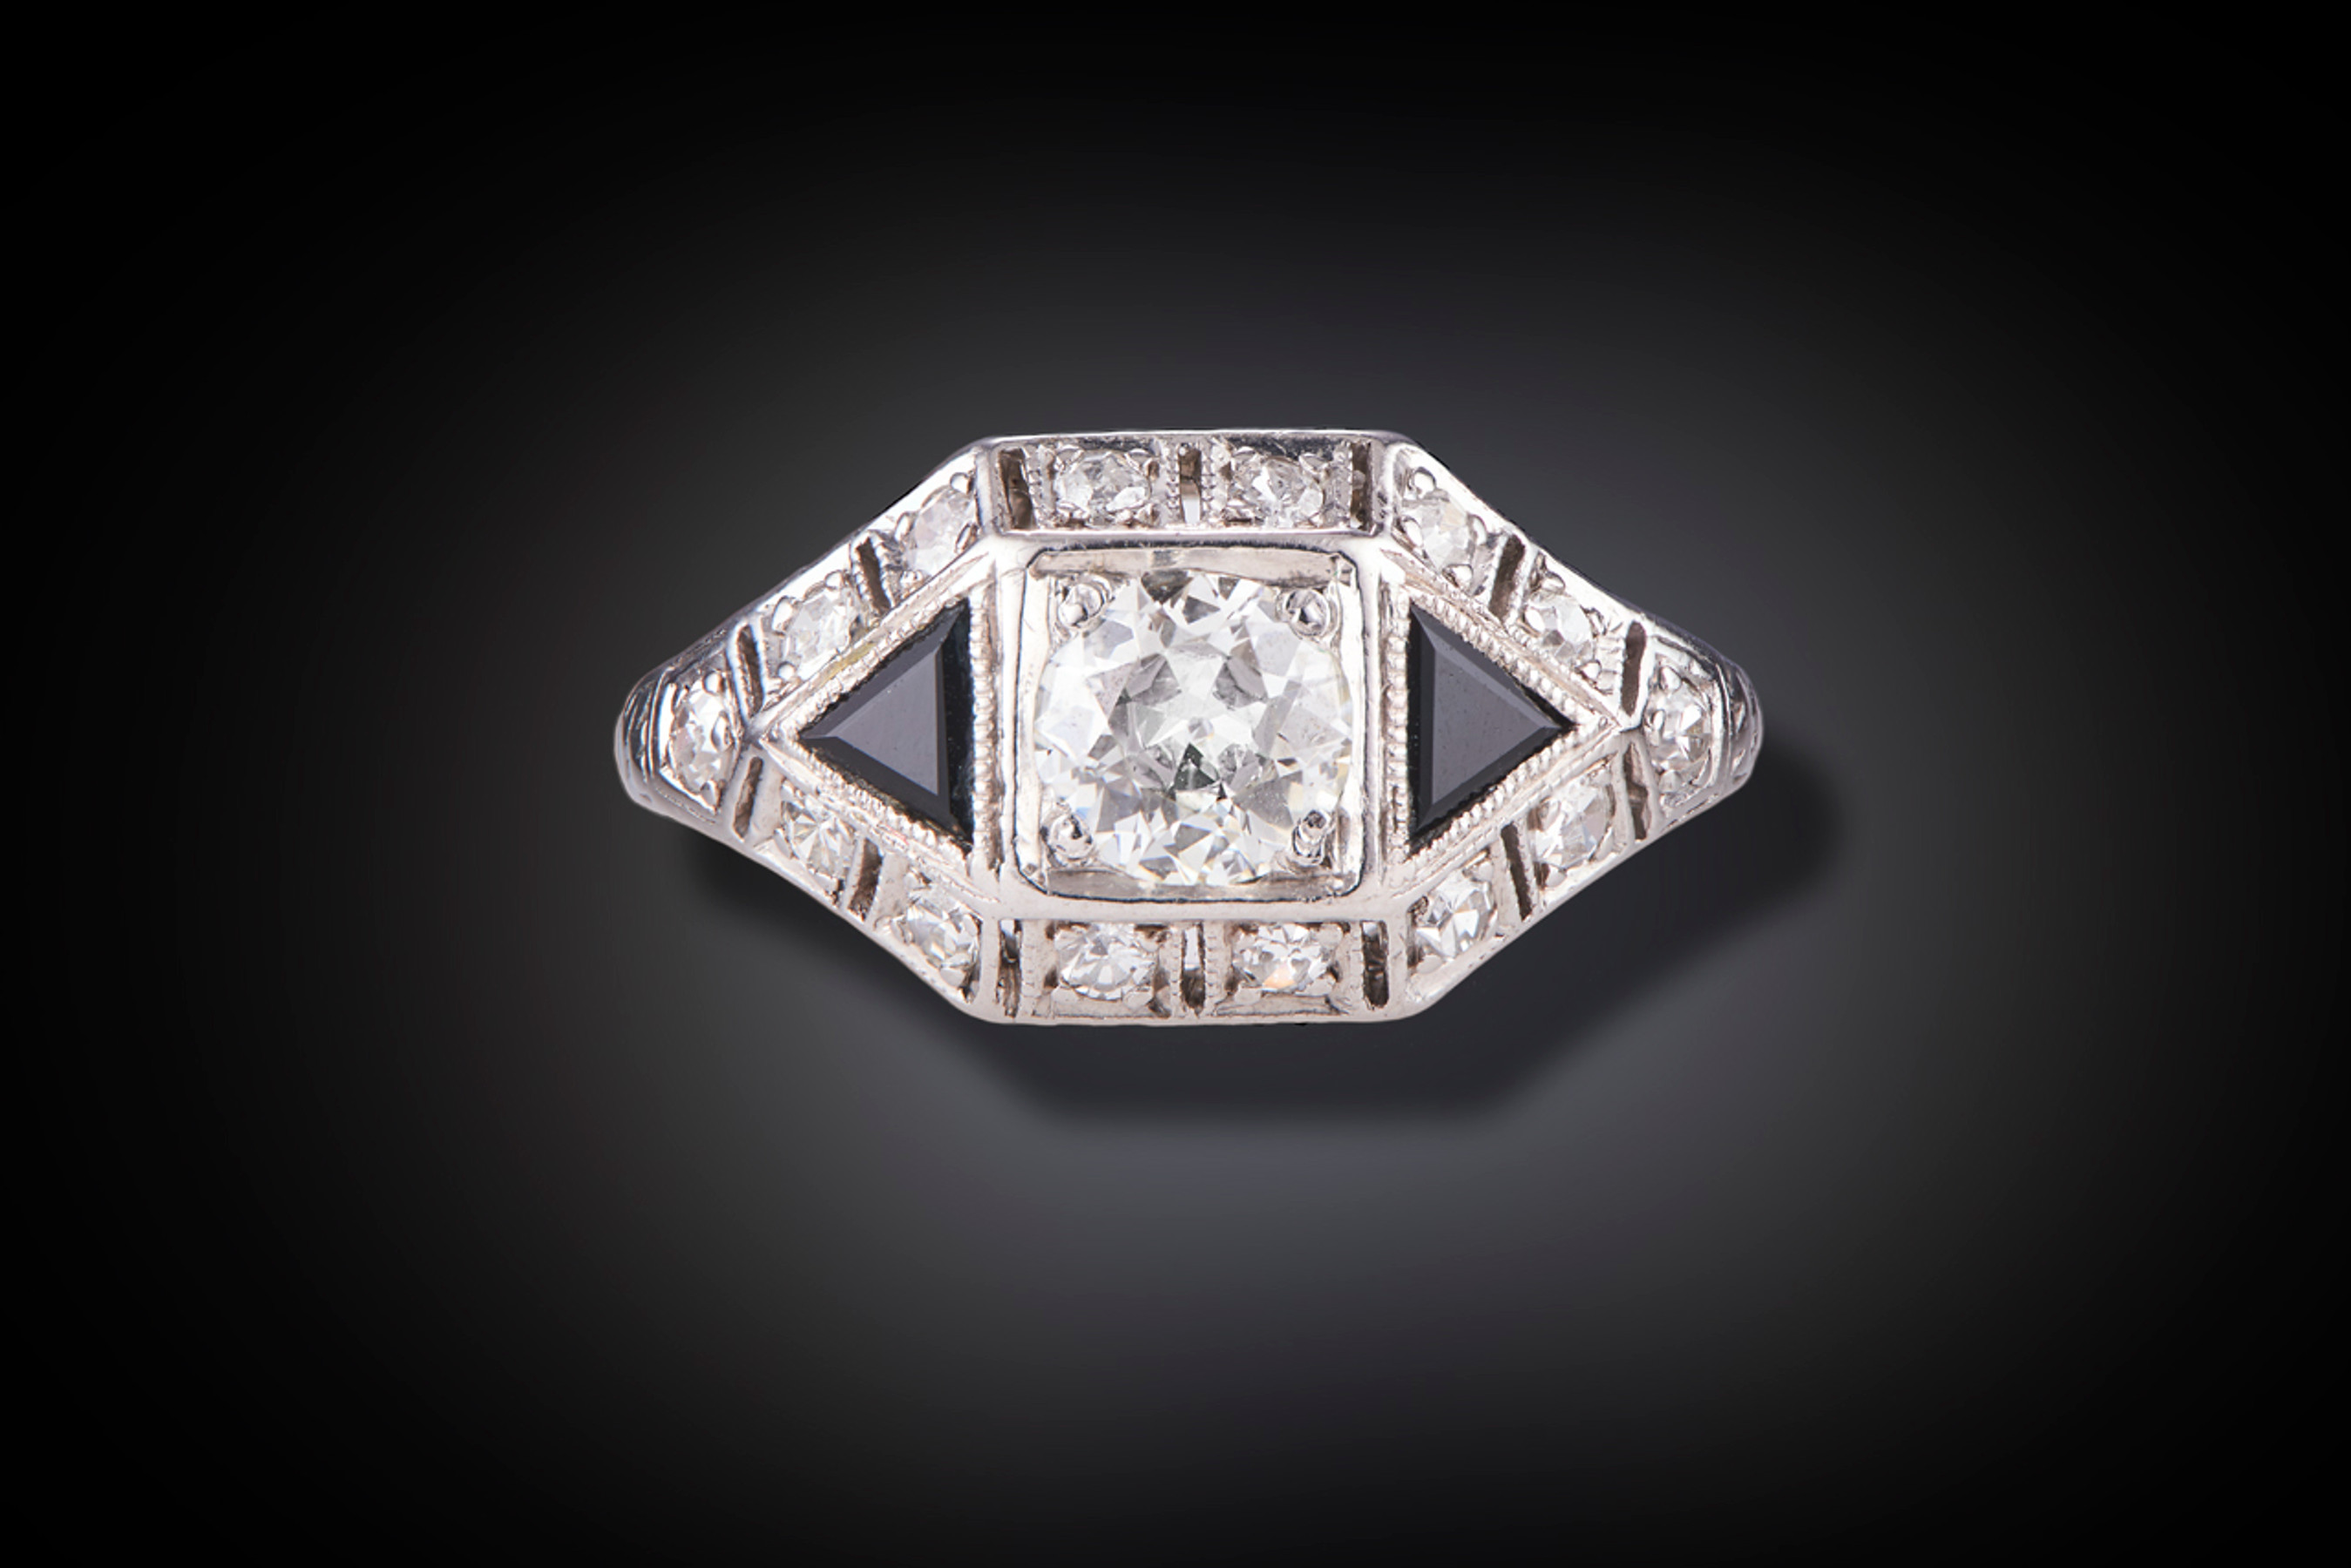 Stylish Art Deco Diamond and Onyx Cluster Ring